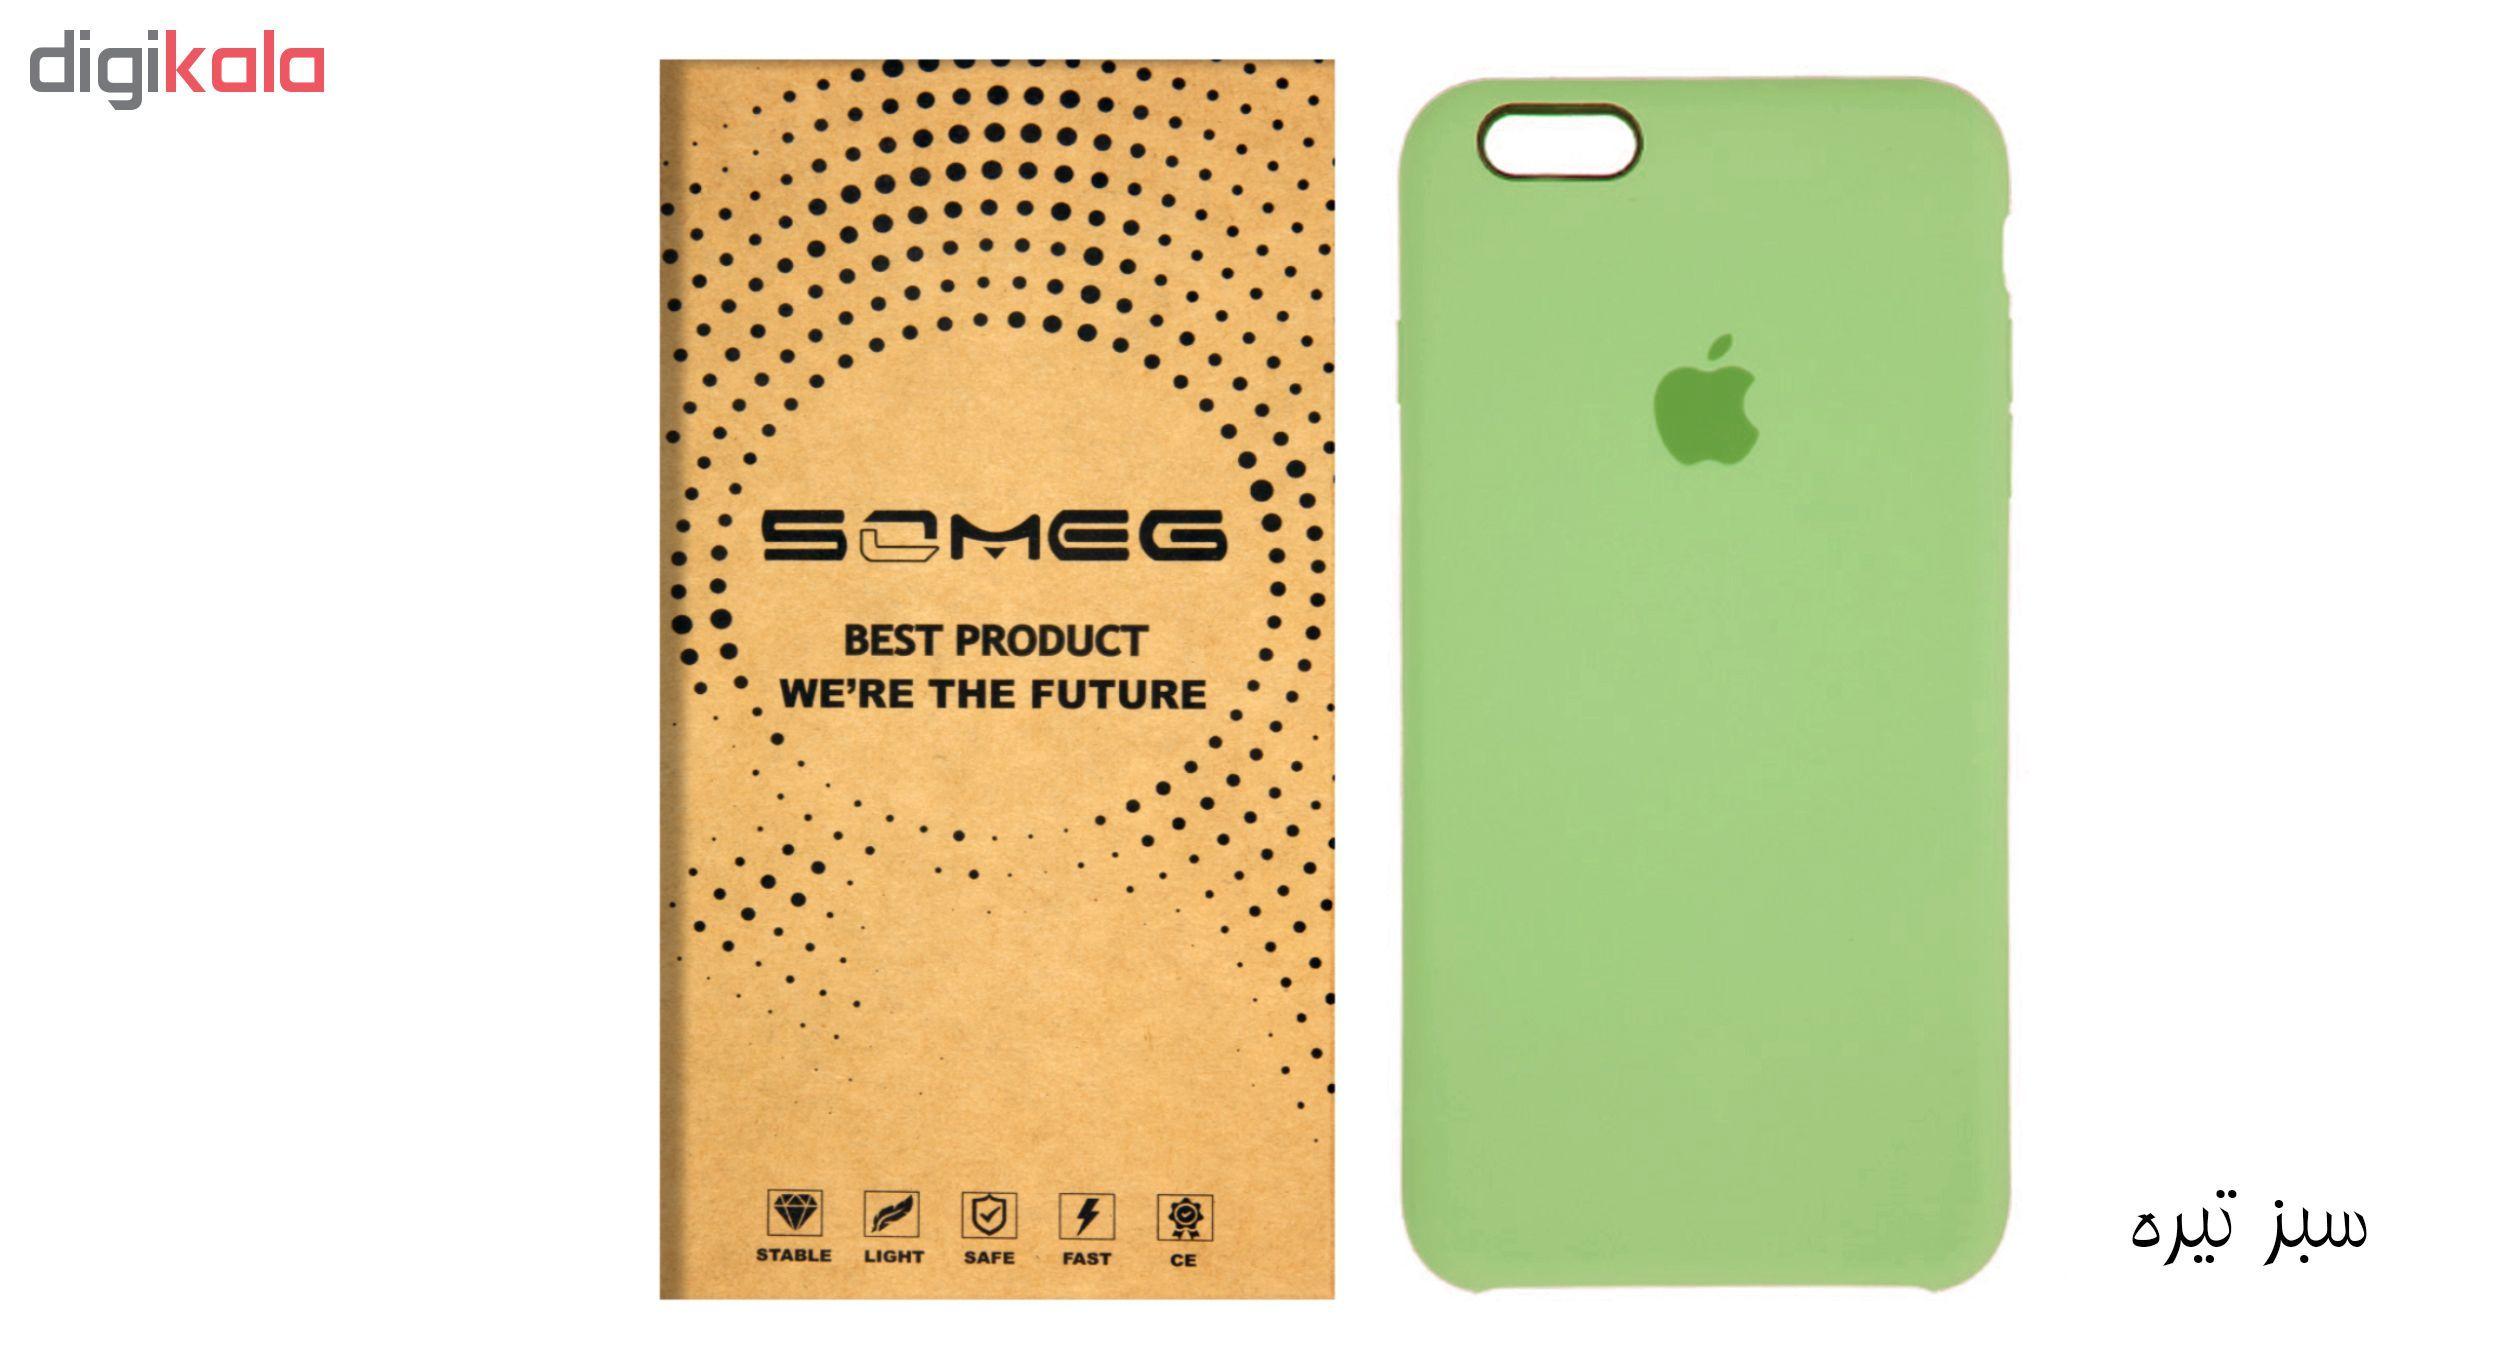 کاور سومگ مدل SIC مناسب برای گوشی موبایل اپل iPhone 6/6s main 1 9